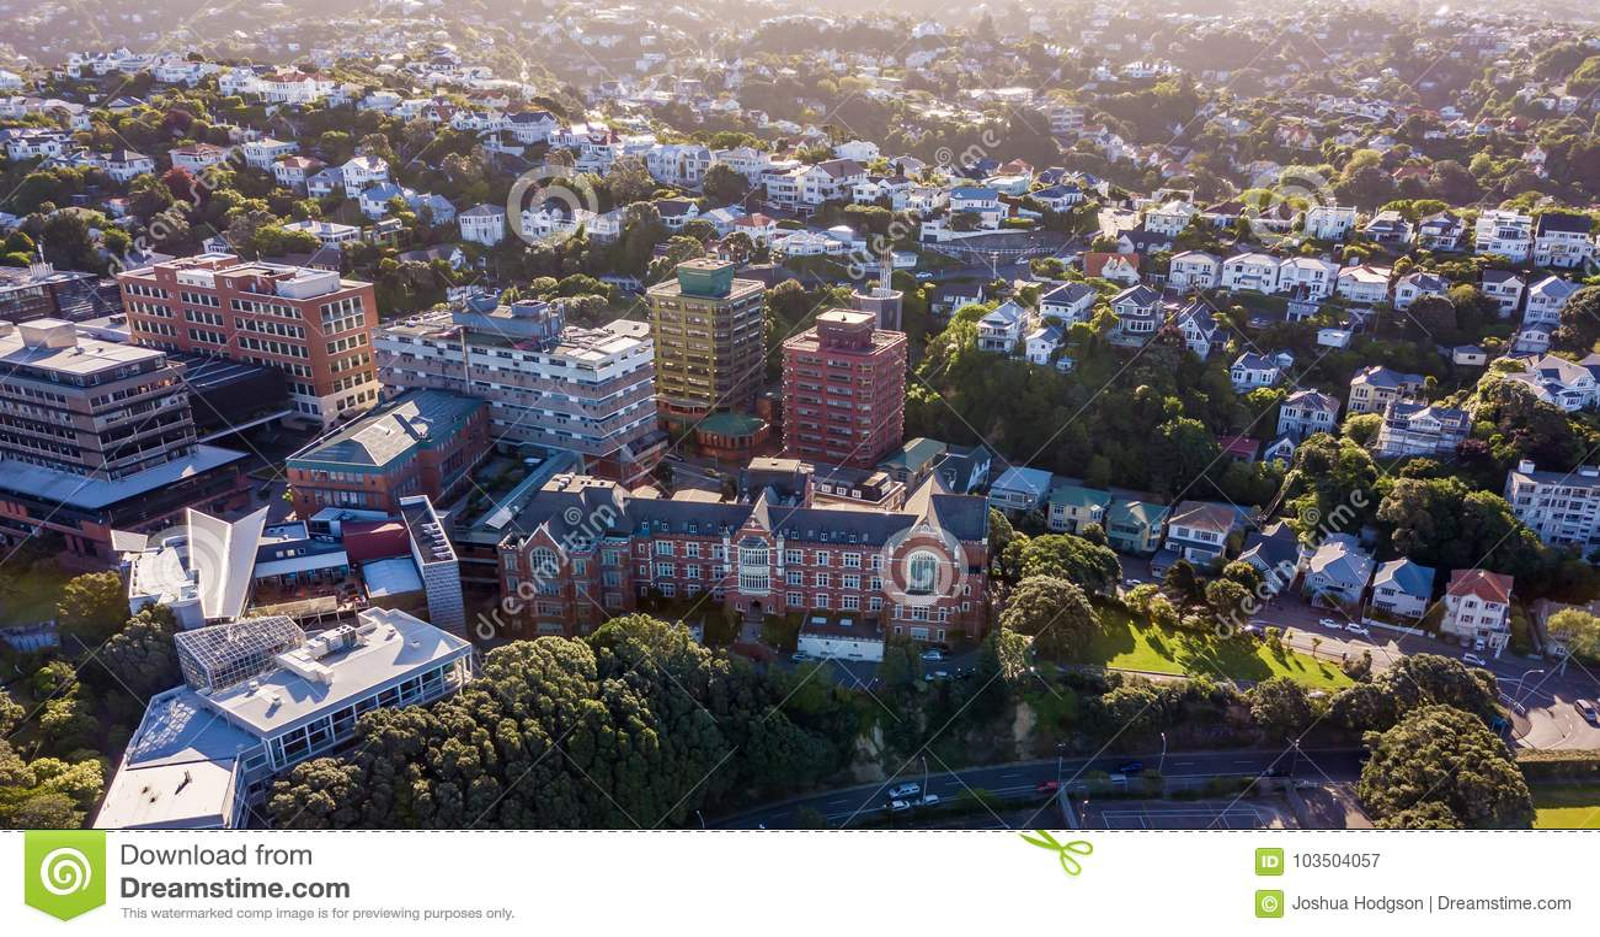 Kelburn Campus Victoria University Aerial View Stock Image Image